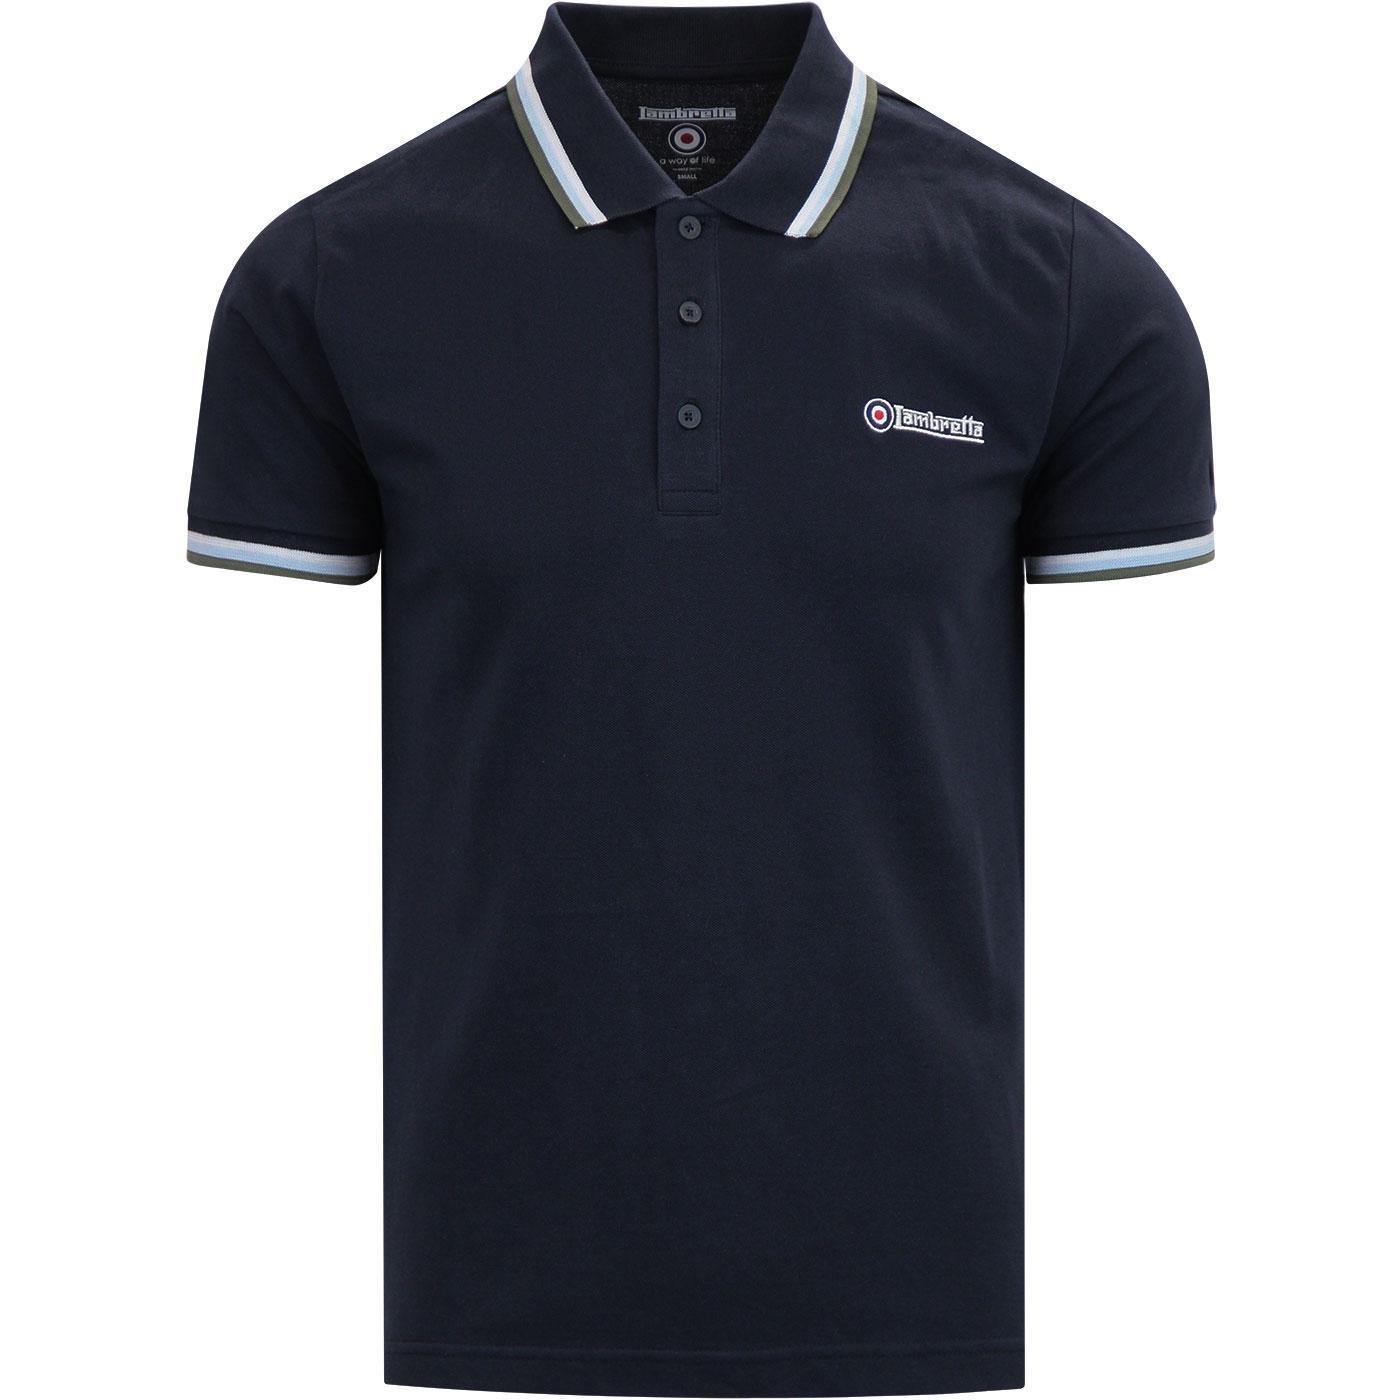 LAMBRETTA Triple Tipped Mod Pique Polo Shirt NAVY